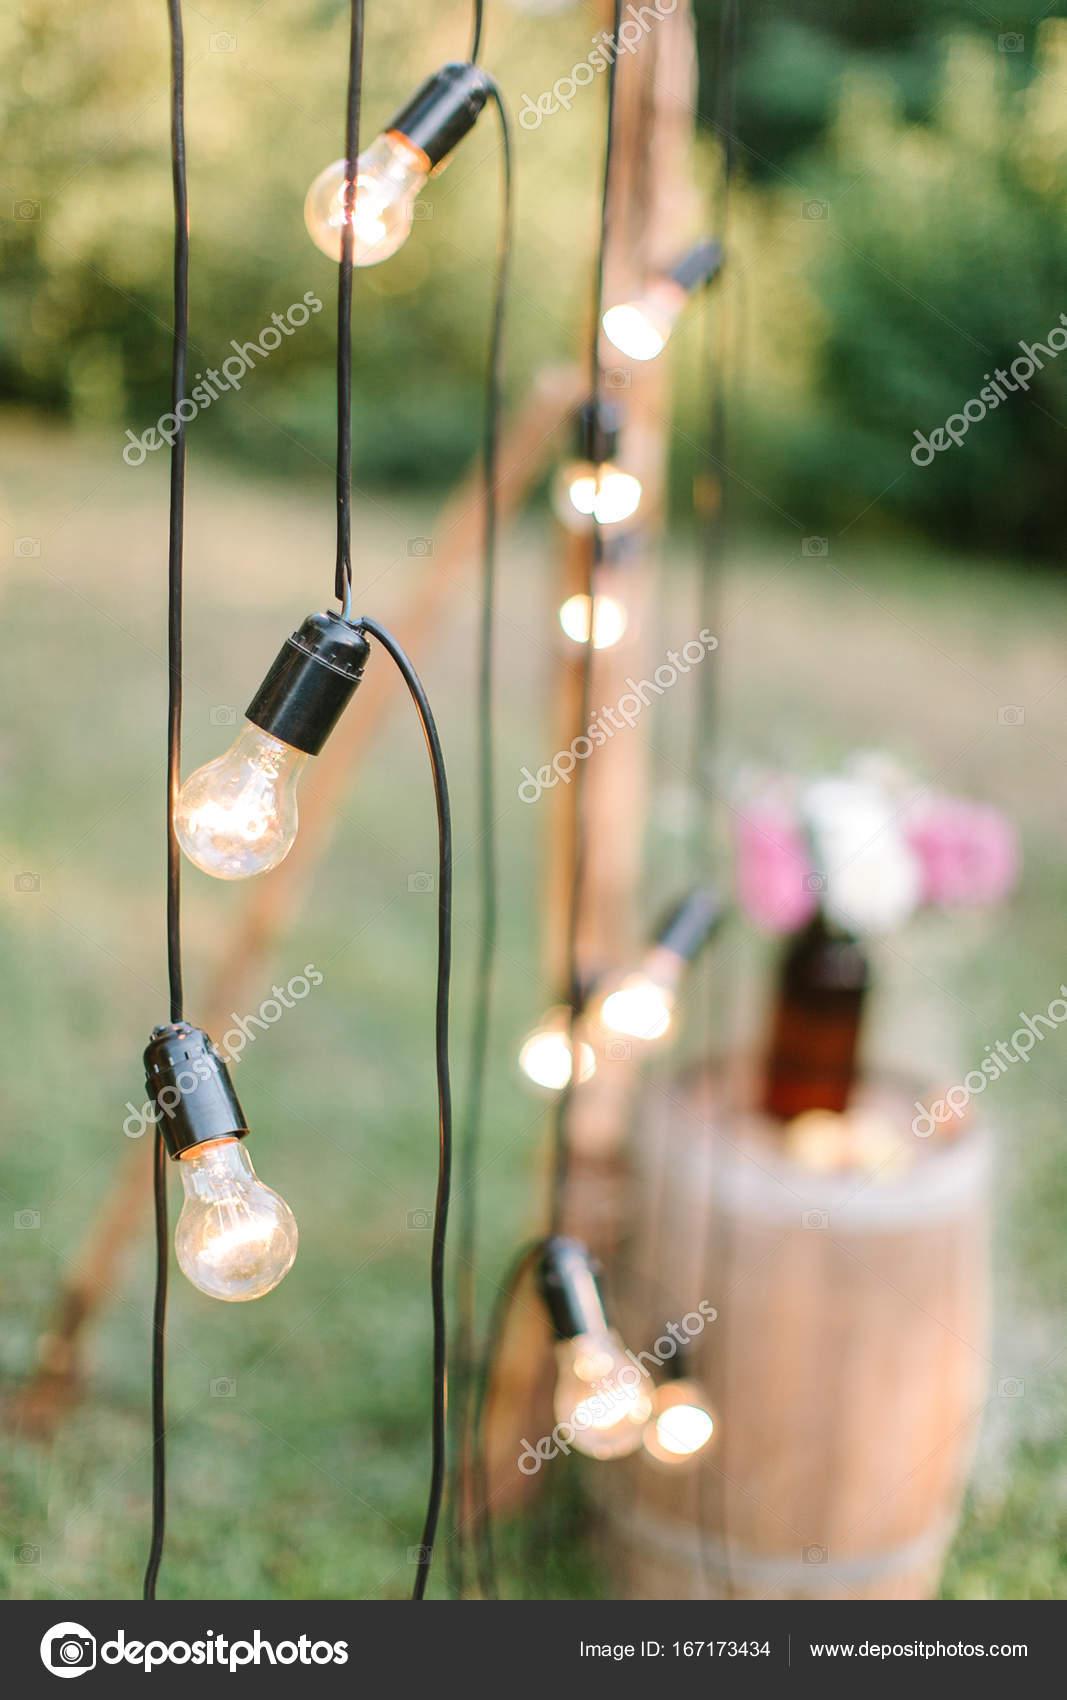 https://st3.depositphotos.com/5840274/16717/i/1600/depositphotos_167173434-stockafbeelding-decoratie-verlichting-bruiloft-concept-close.jpg